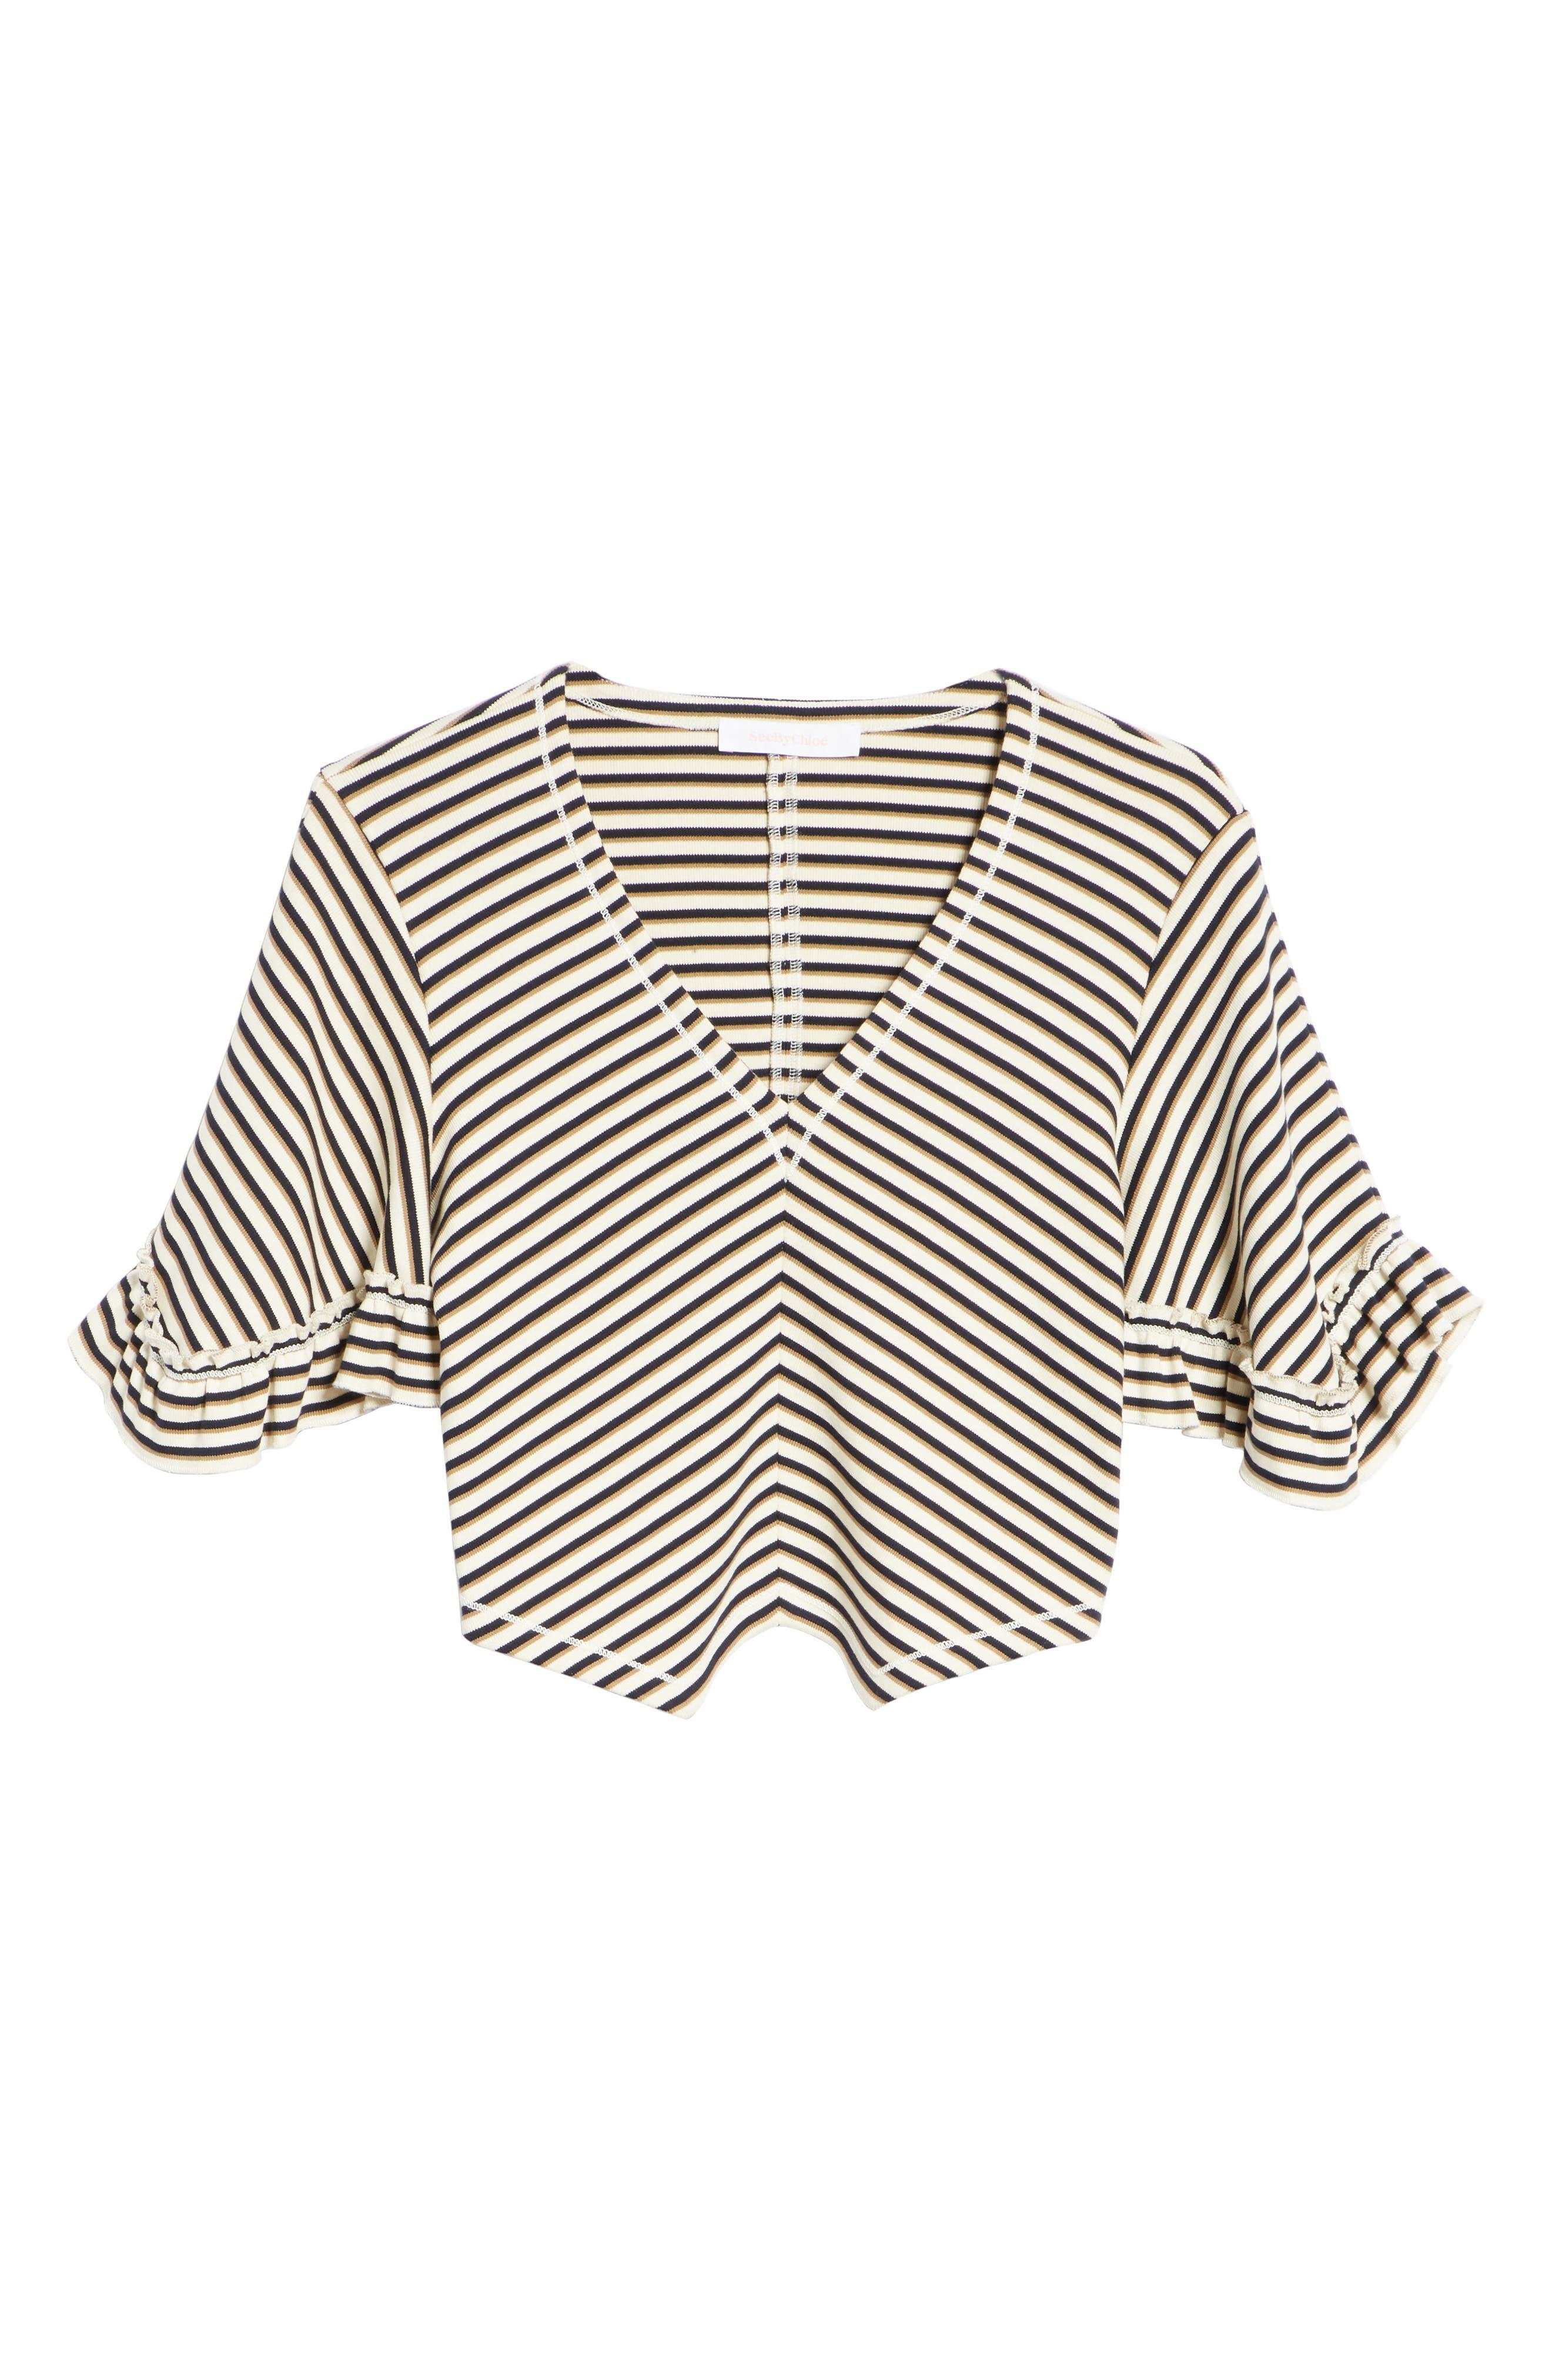 Stripe Top,                             Alternate thumbnail 6, color,                             WHITE - BEIGE 1